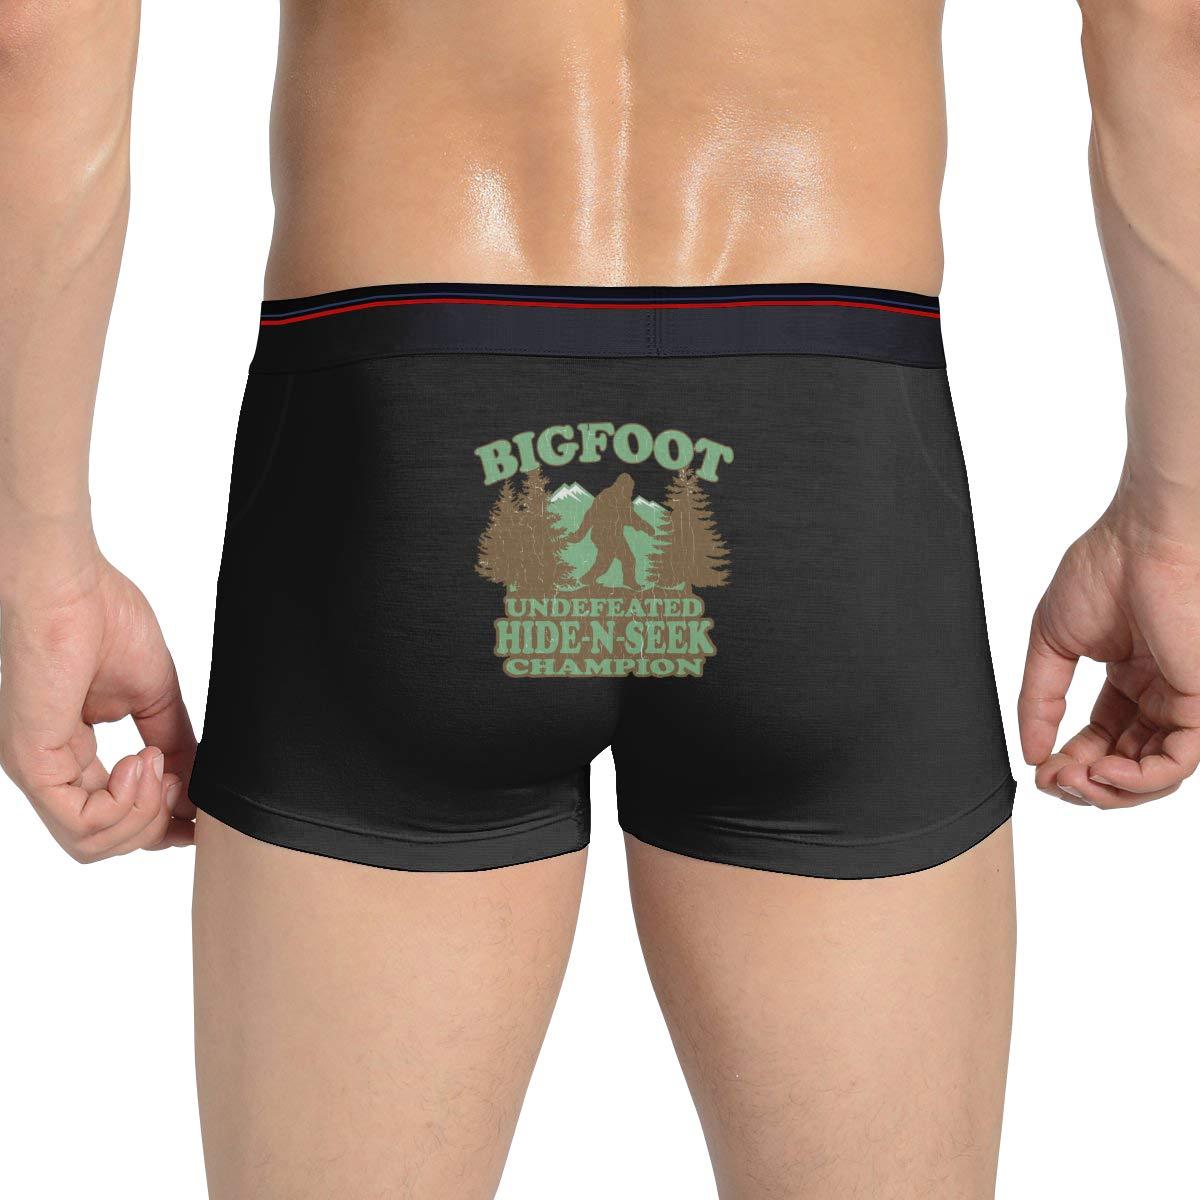 Bigfoot Hide-N-Seek Man Underwear Soft Boxer Brief SY COMPACT Funny